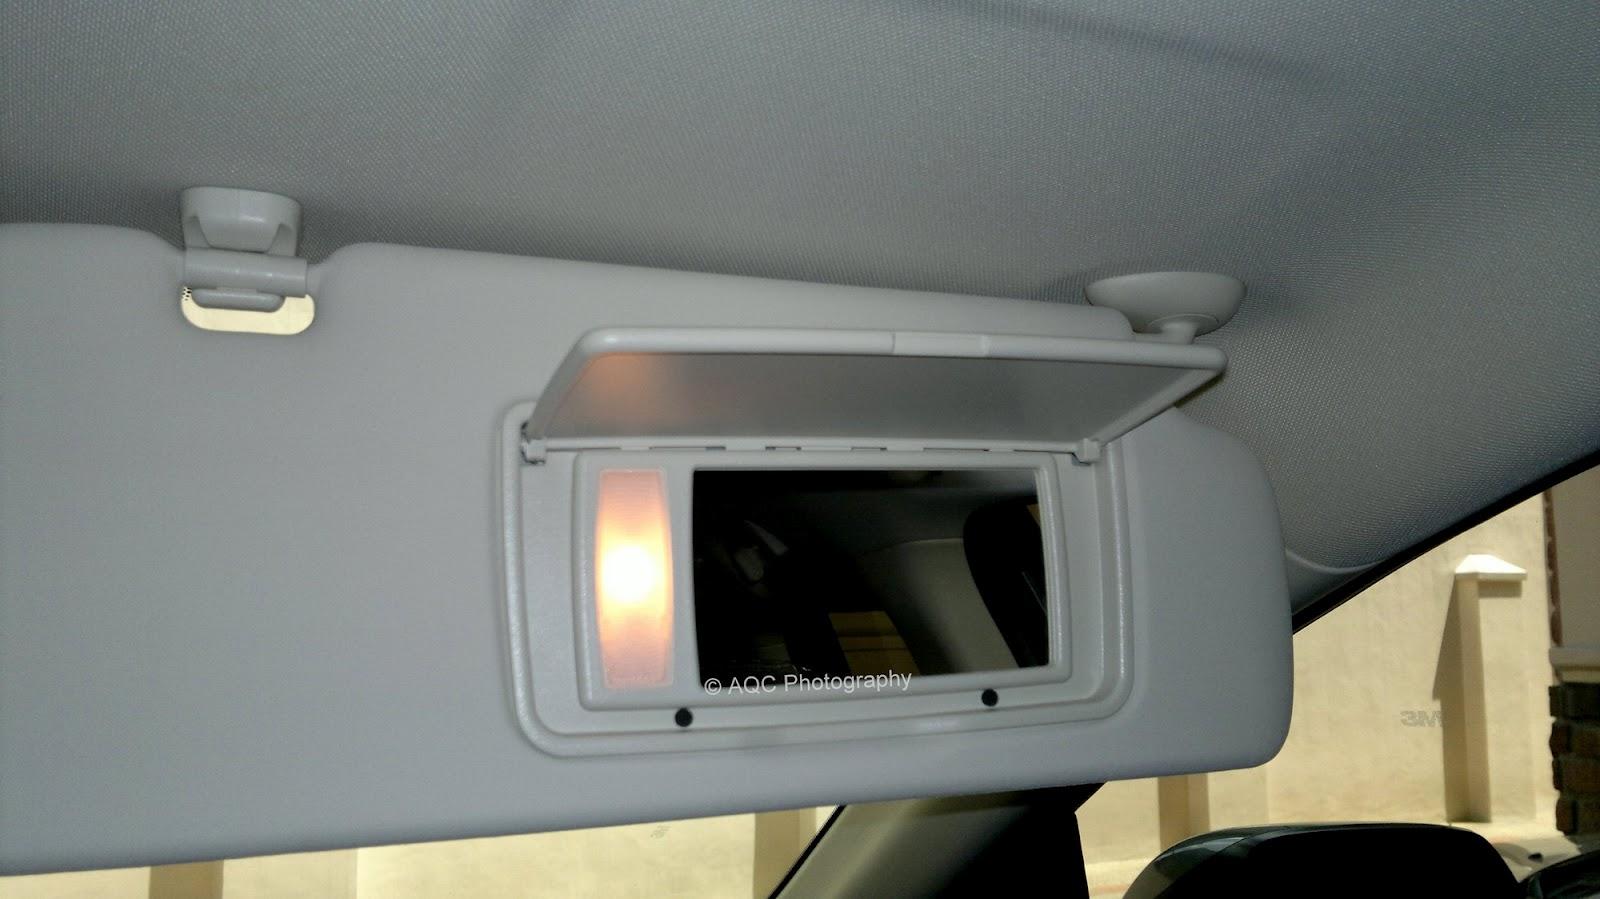 Vanity Mirror With Lights Ph : Honda CRV 2012 Manila - Interior and Exterior Photos ~ Cheftonio's Blog